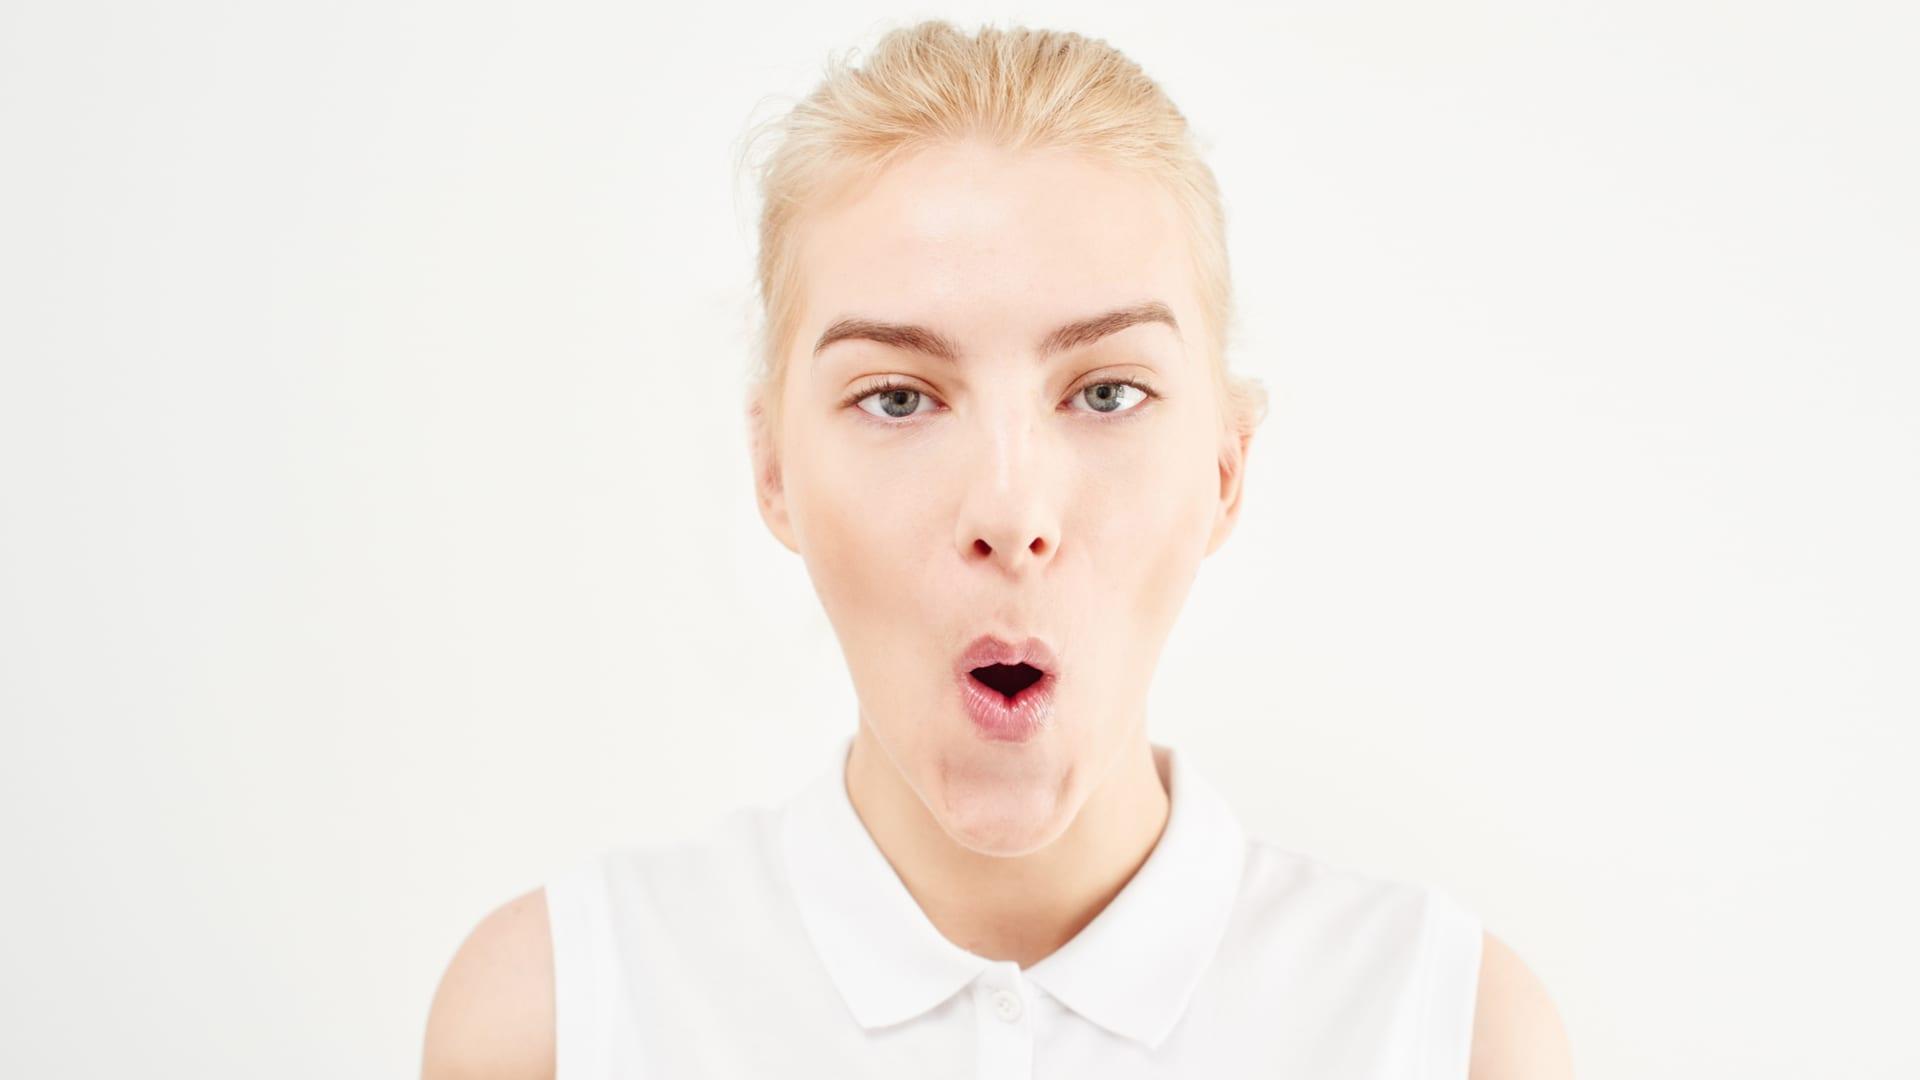 Facial gymnastics: cheekbone lifting exercises.